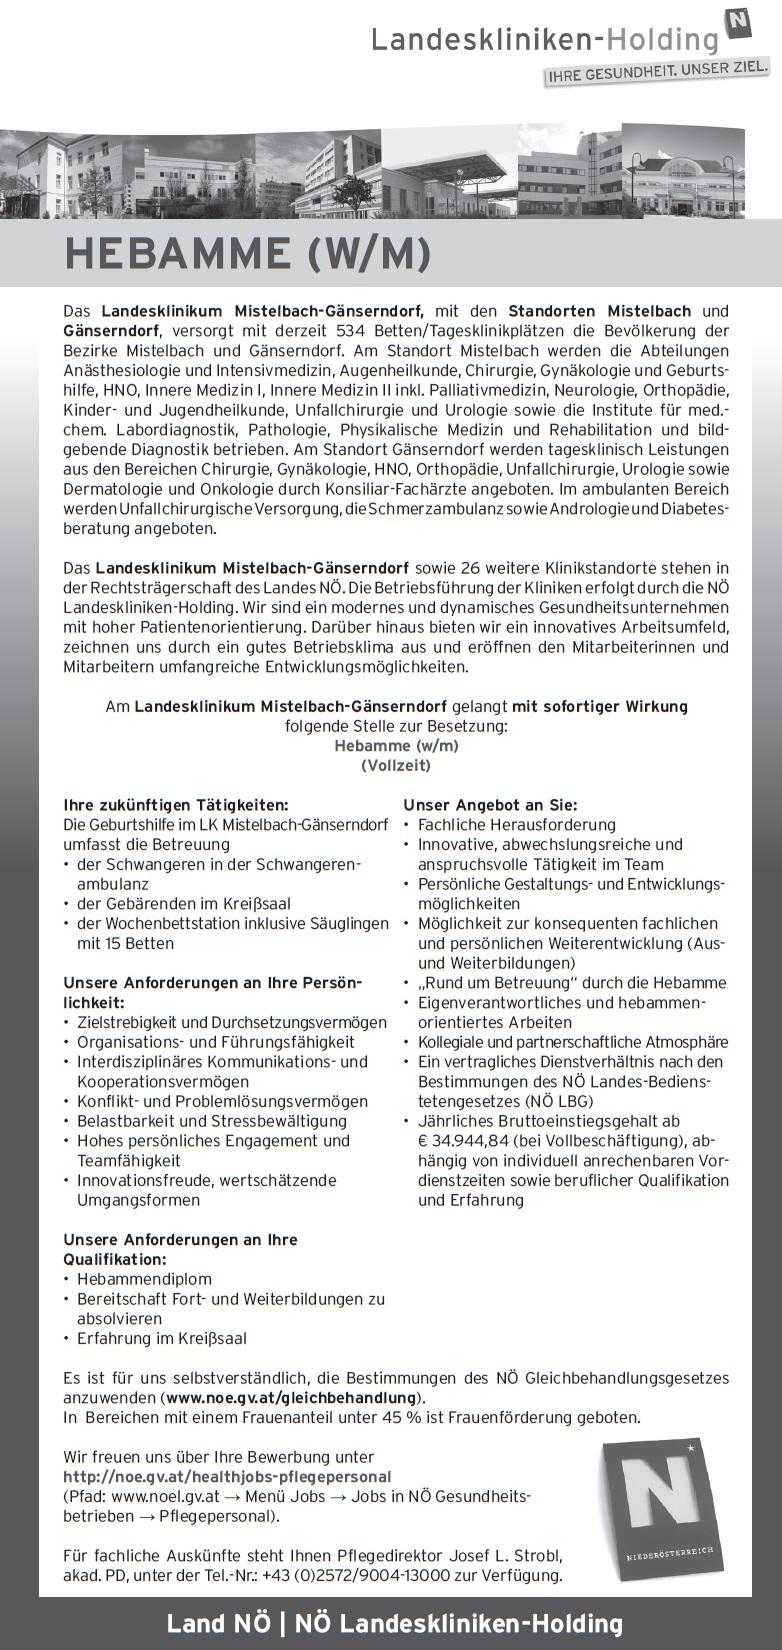 LK Mistelbach-Gänserndorf